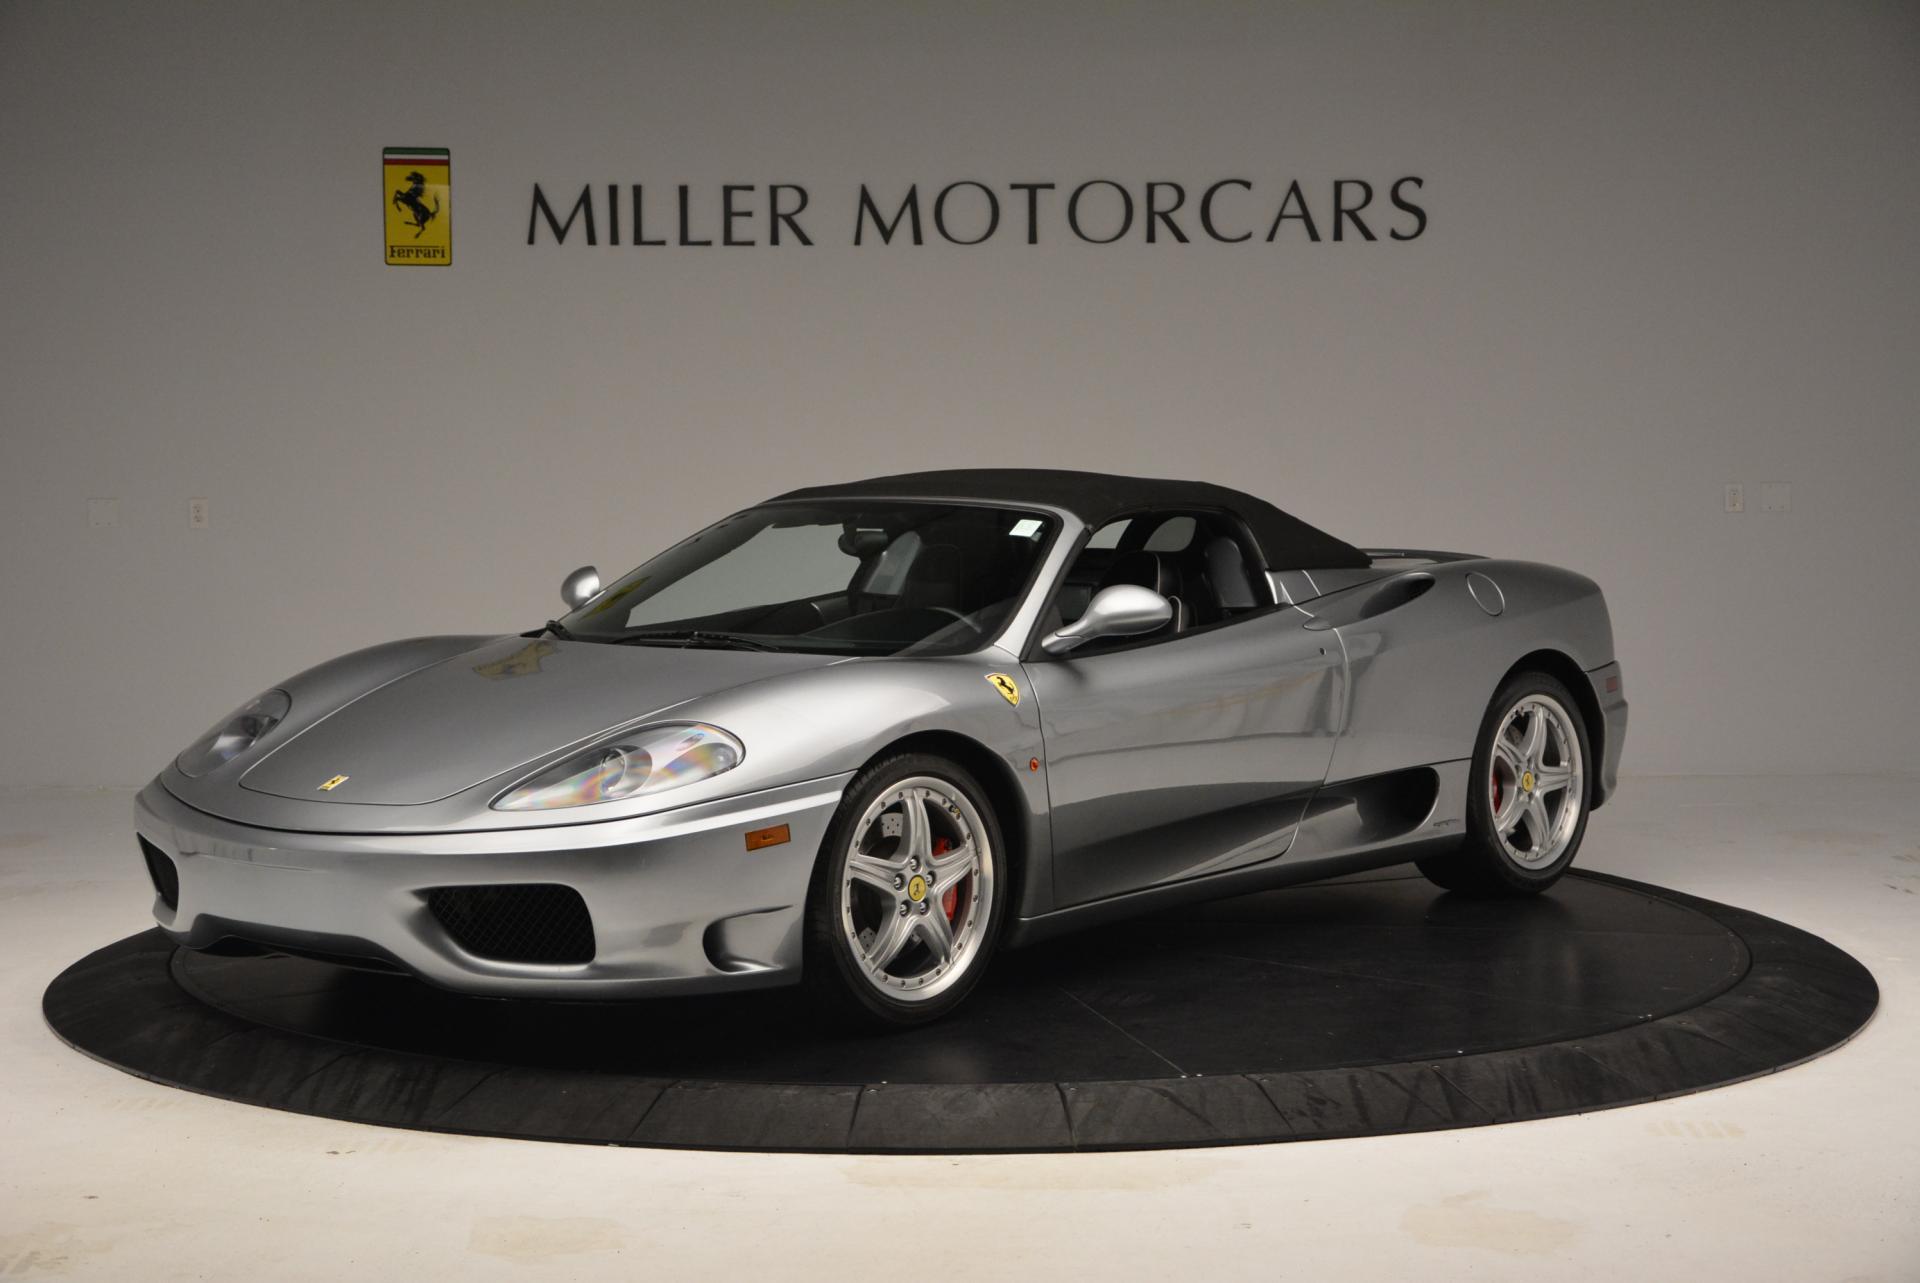 Used 2004 Ferrari 360 Spider 6-Speed Manual  For Sale In Westport, CT 138_p14